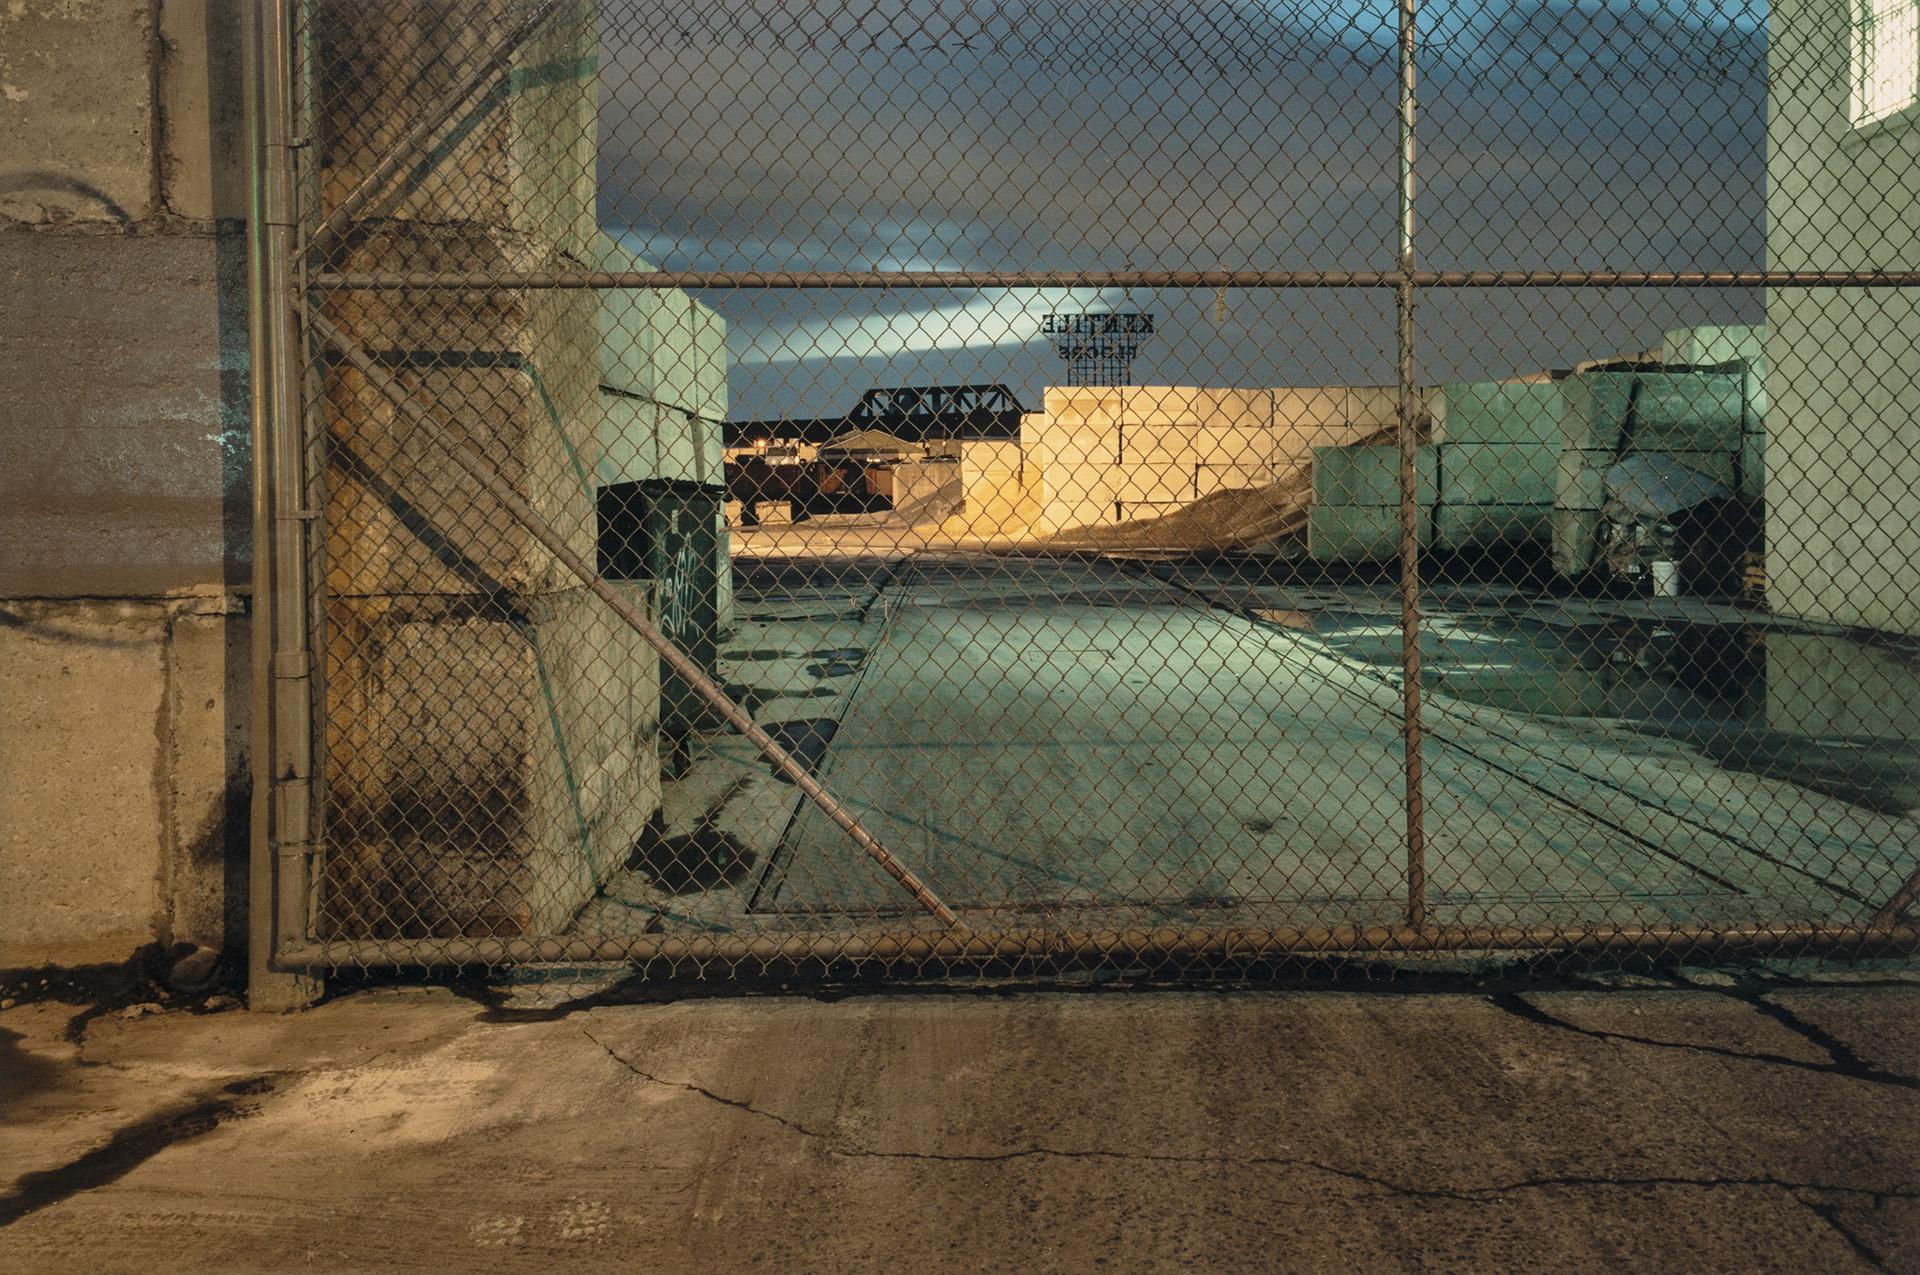 Kentile Floors - Brooklyn, New York